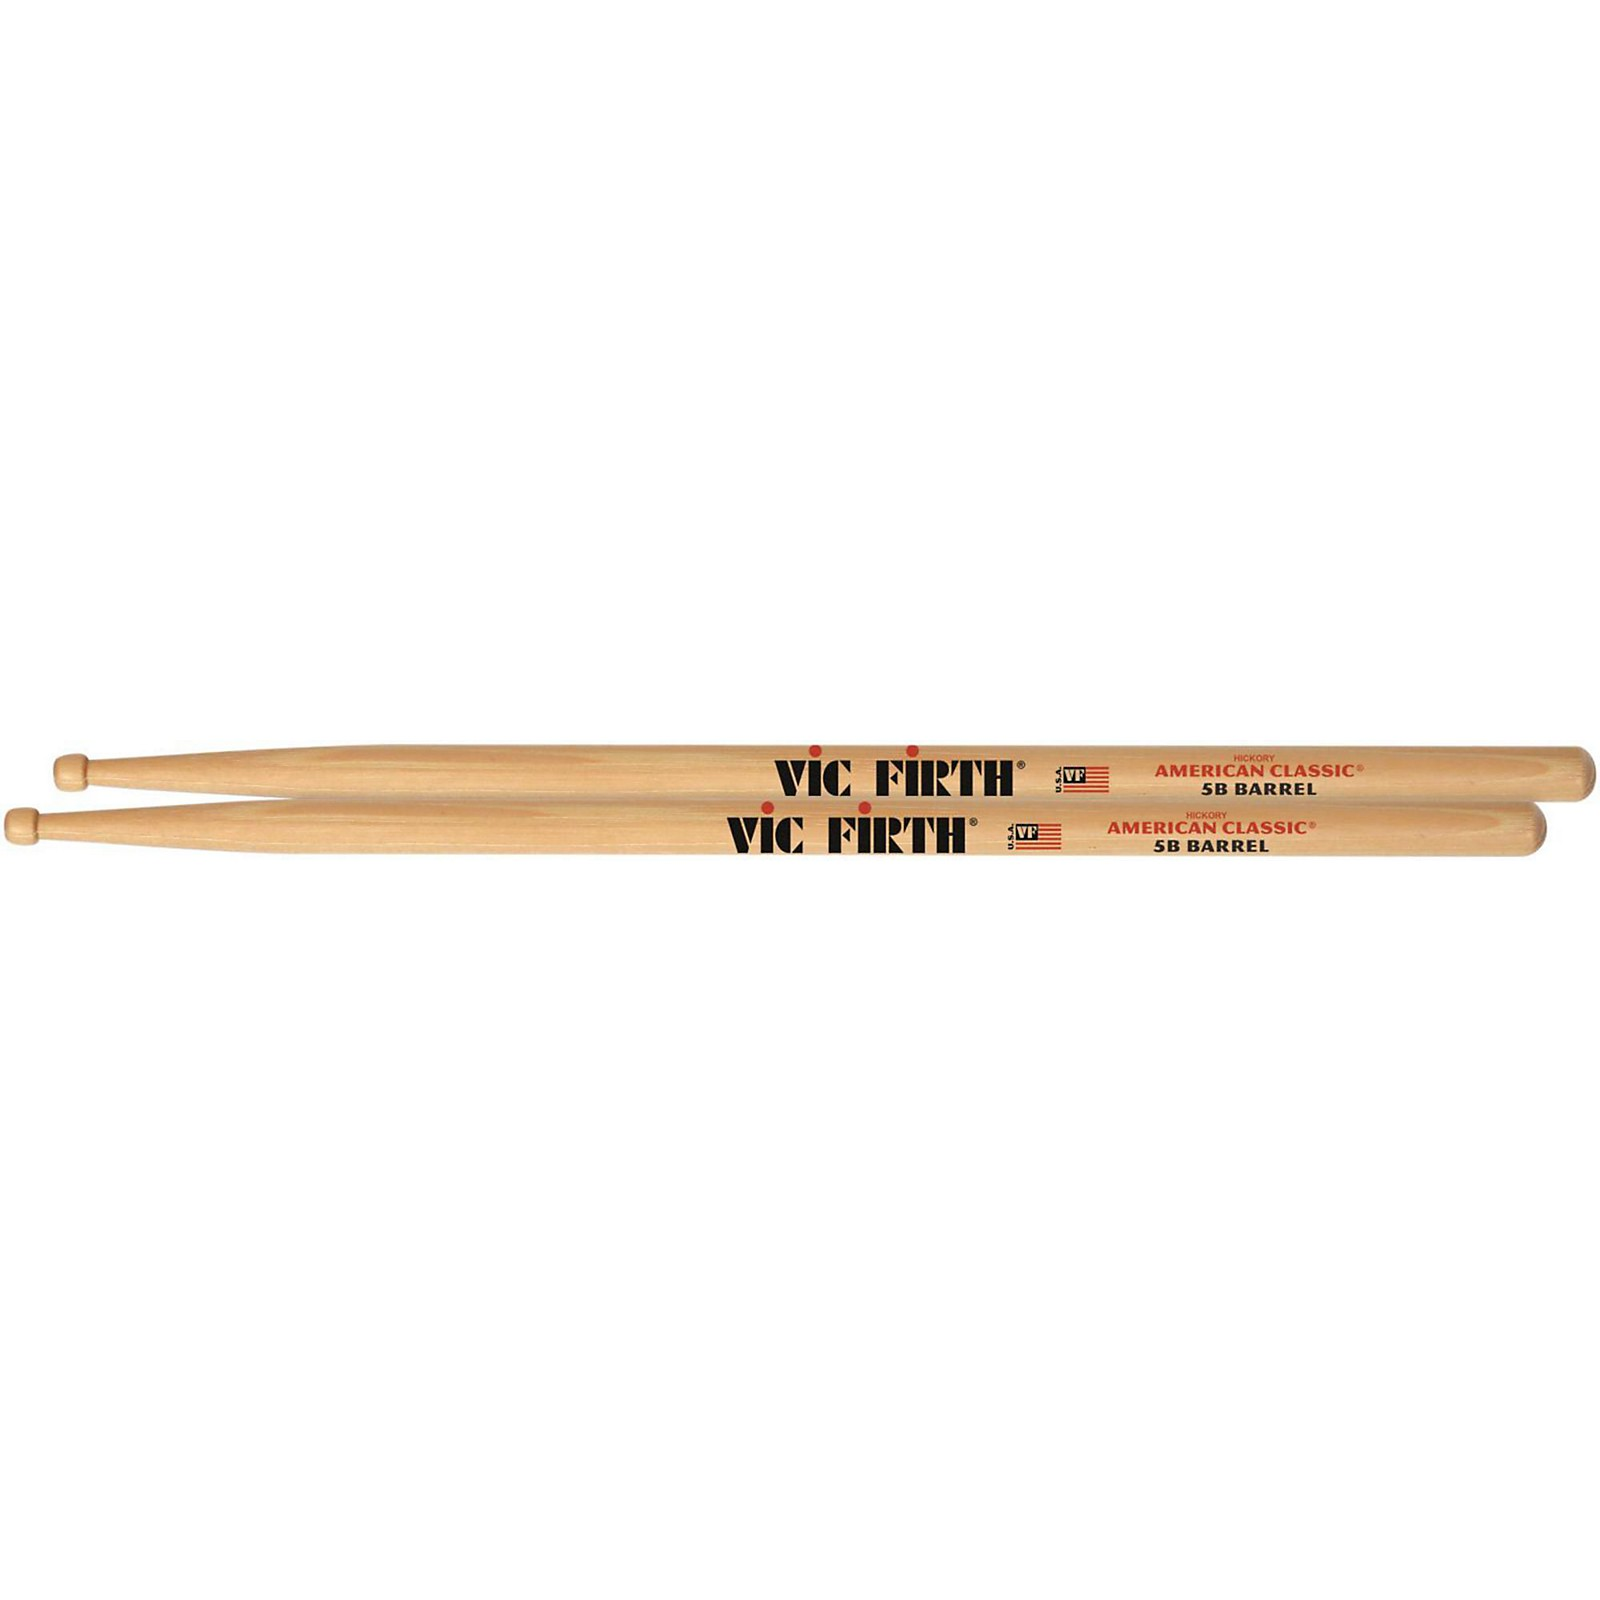 Wood Tip Vic-Firth 5B Barrel Sticks American Classic